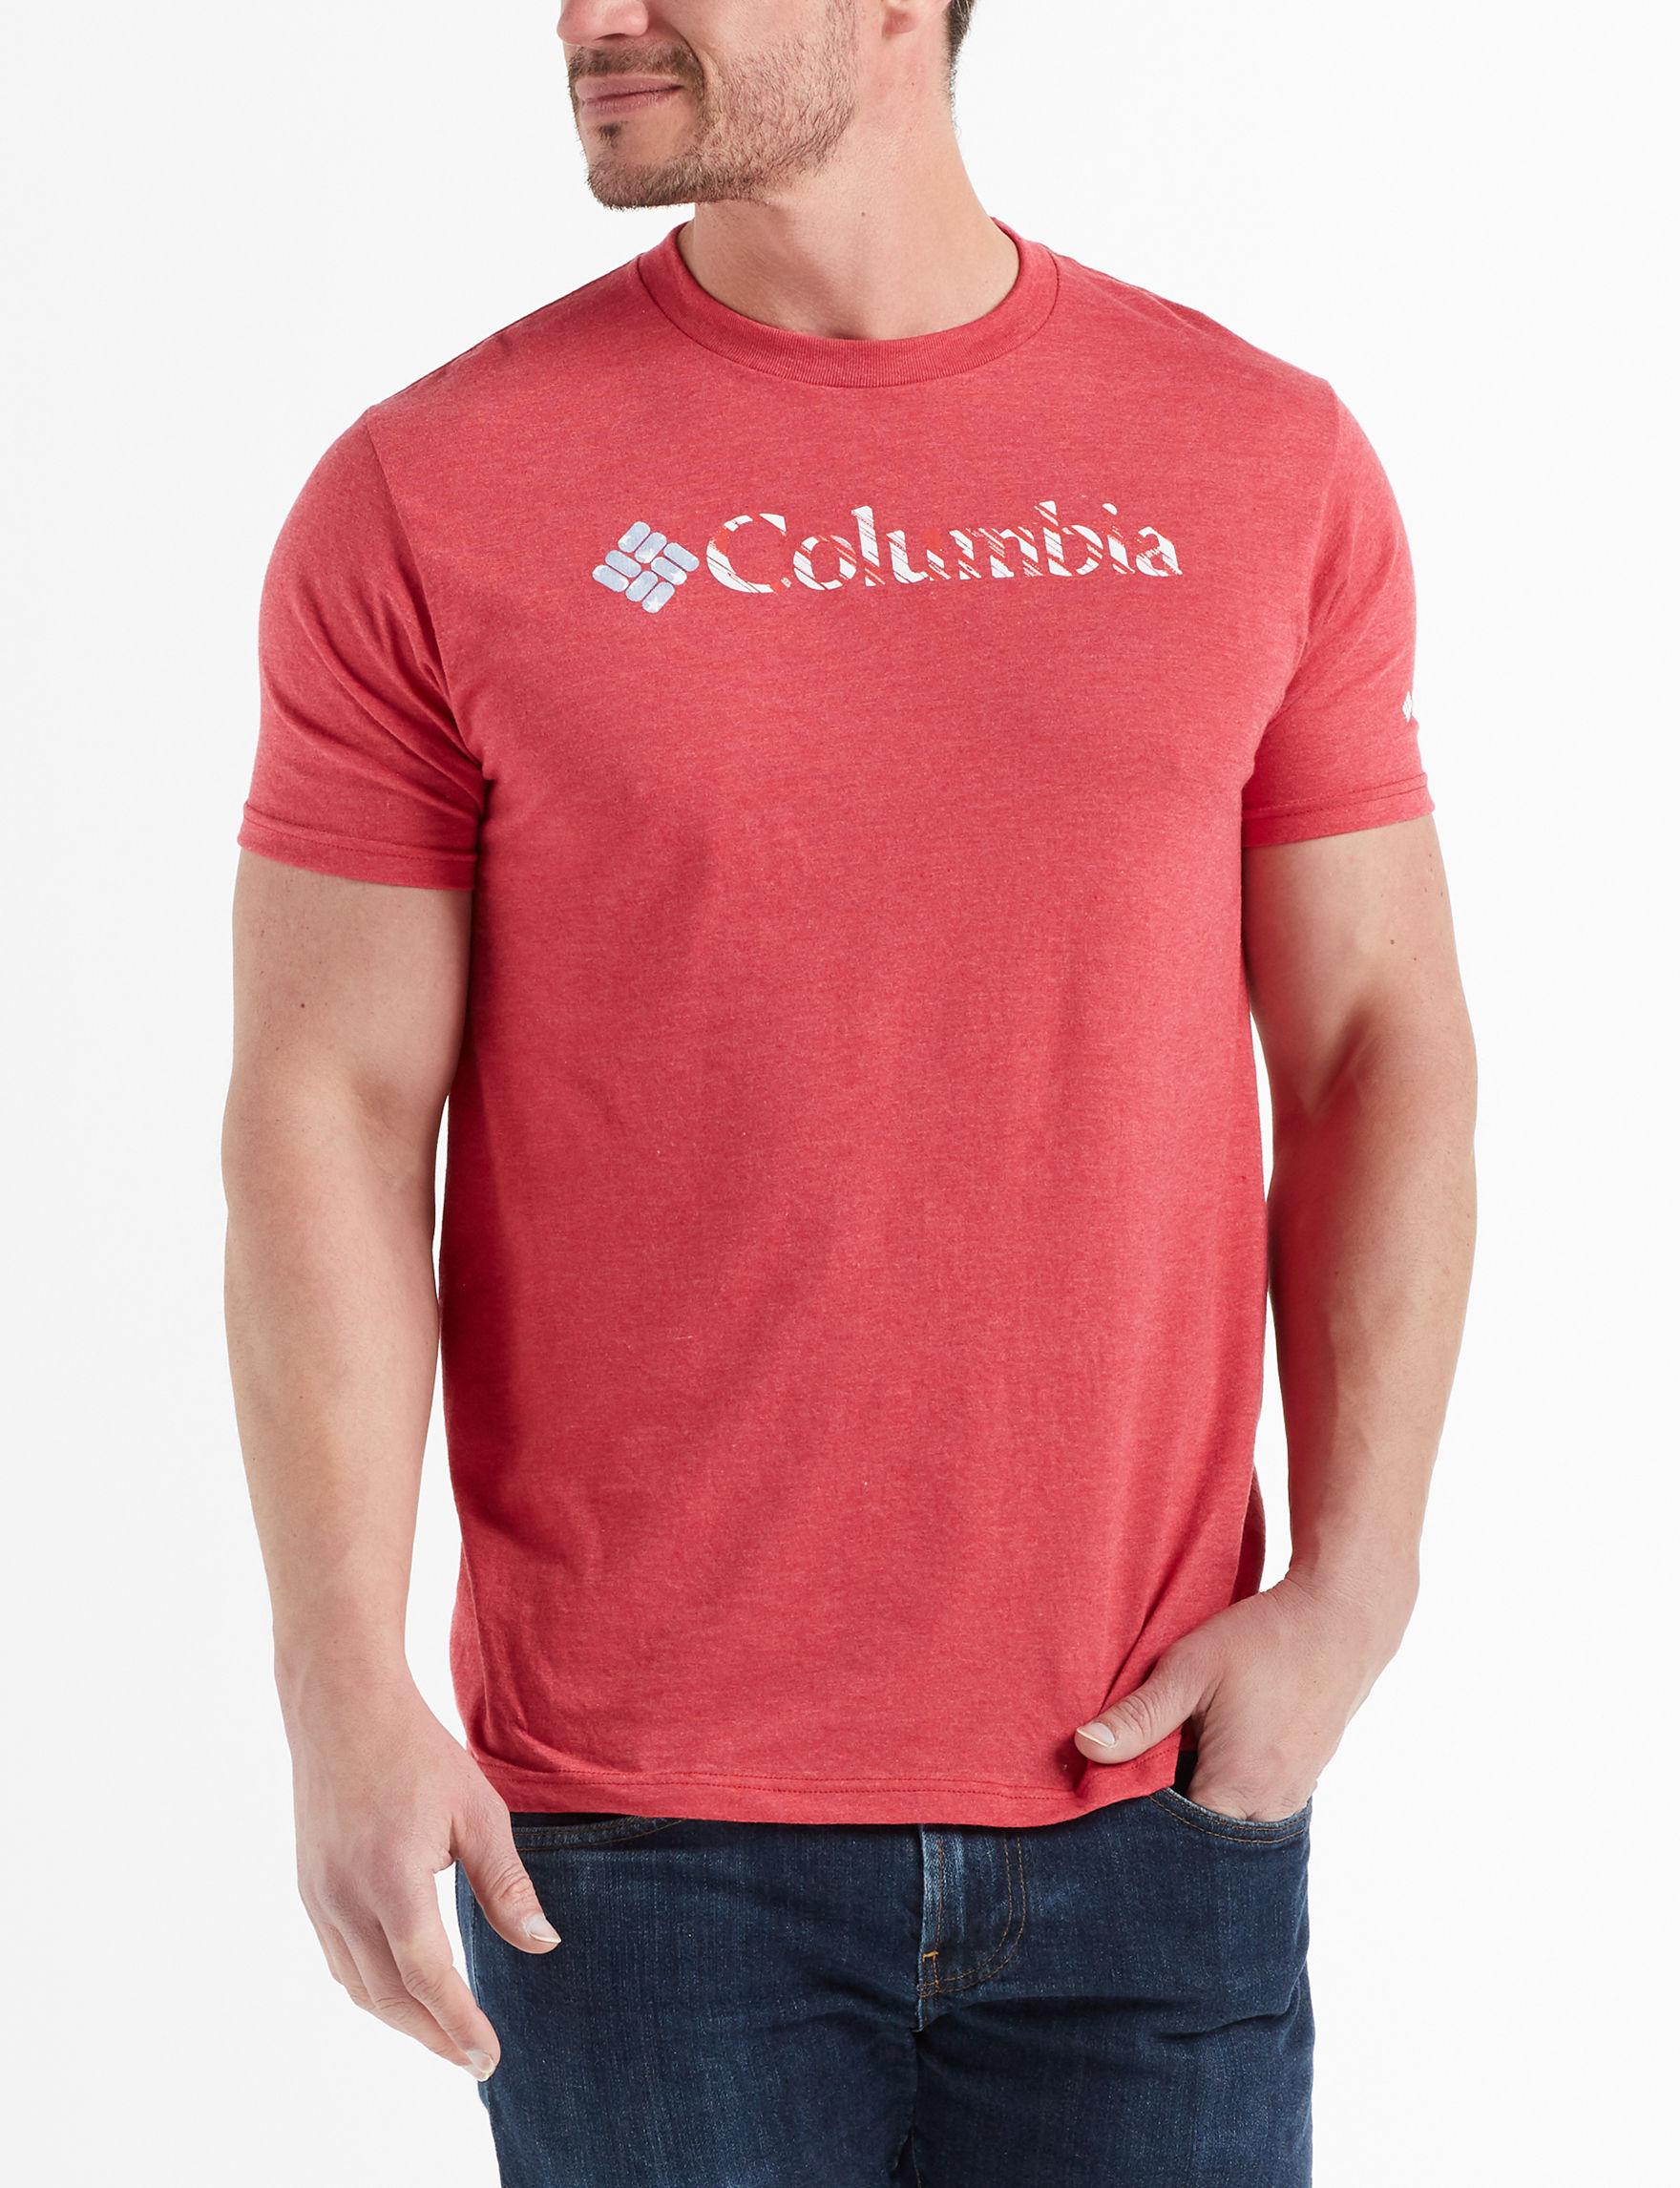 Columbia Heather Red Tees & Tanks